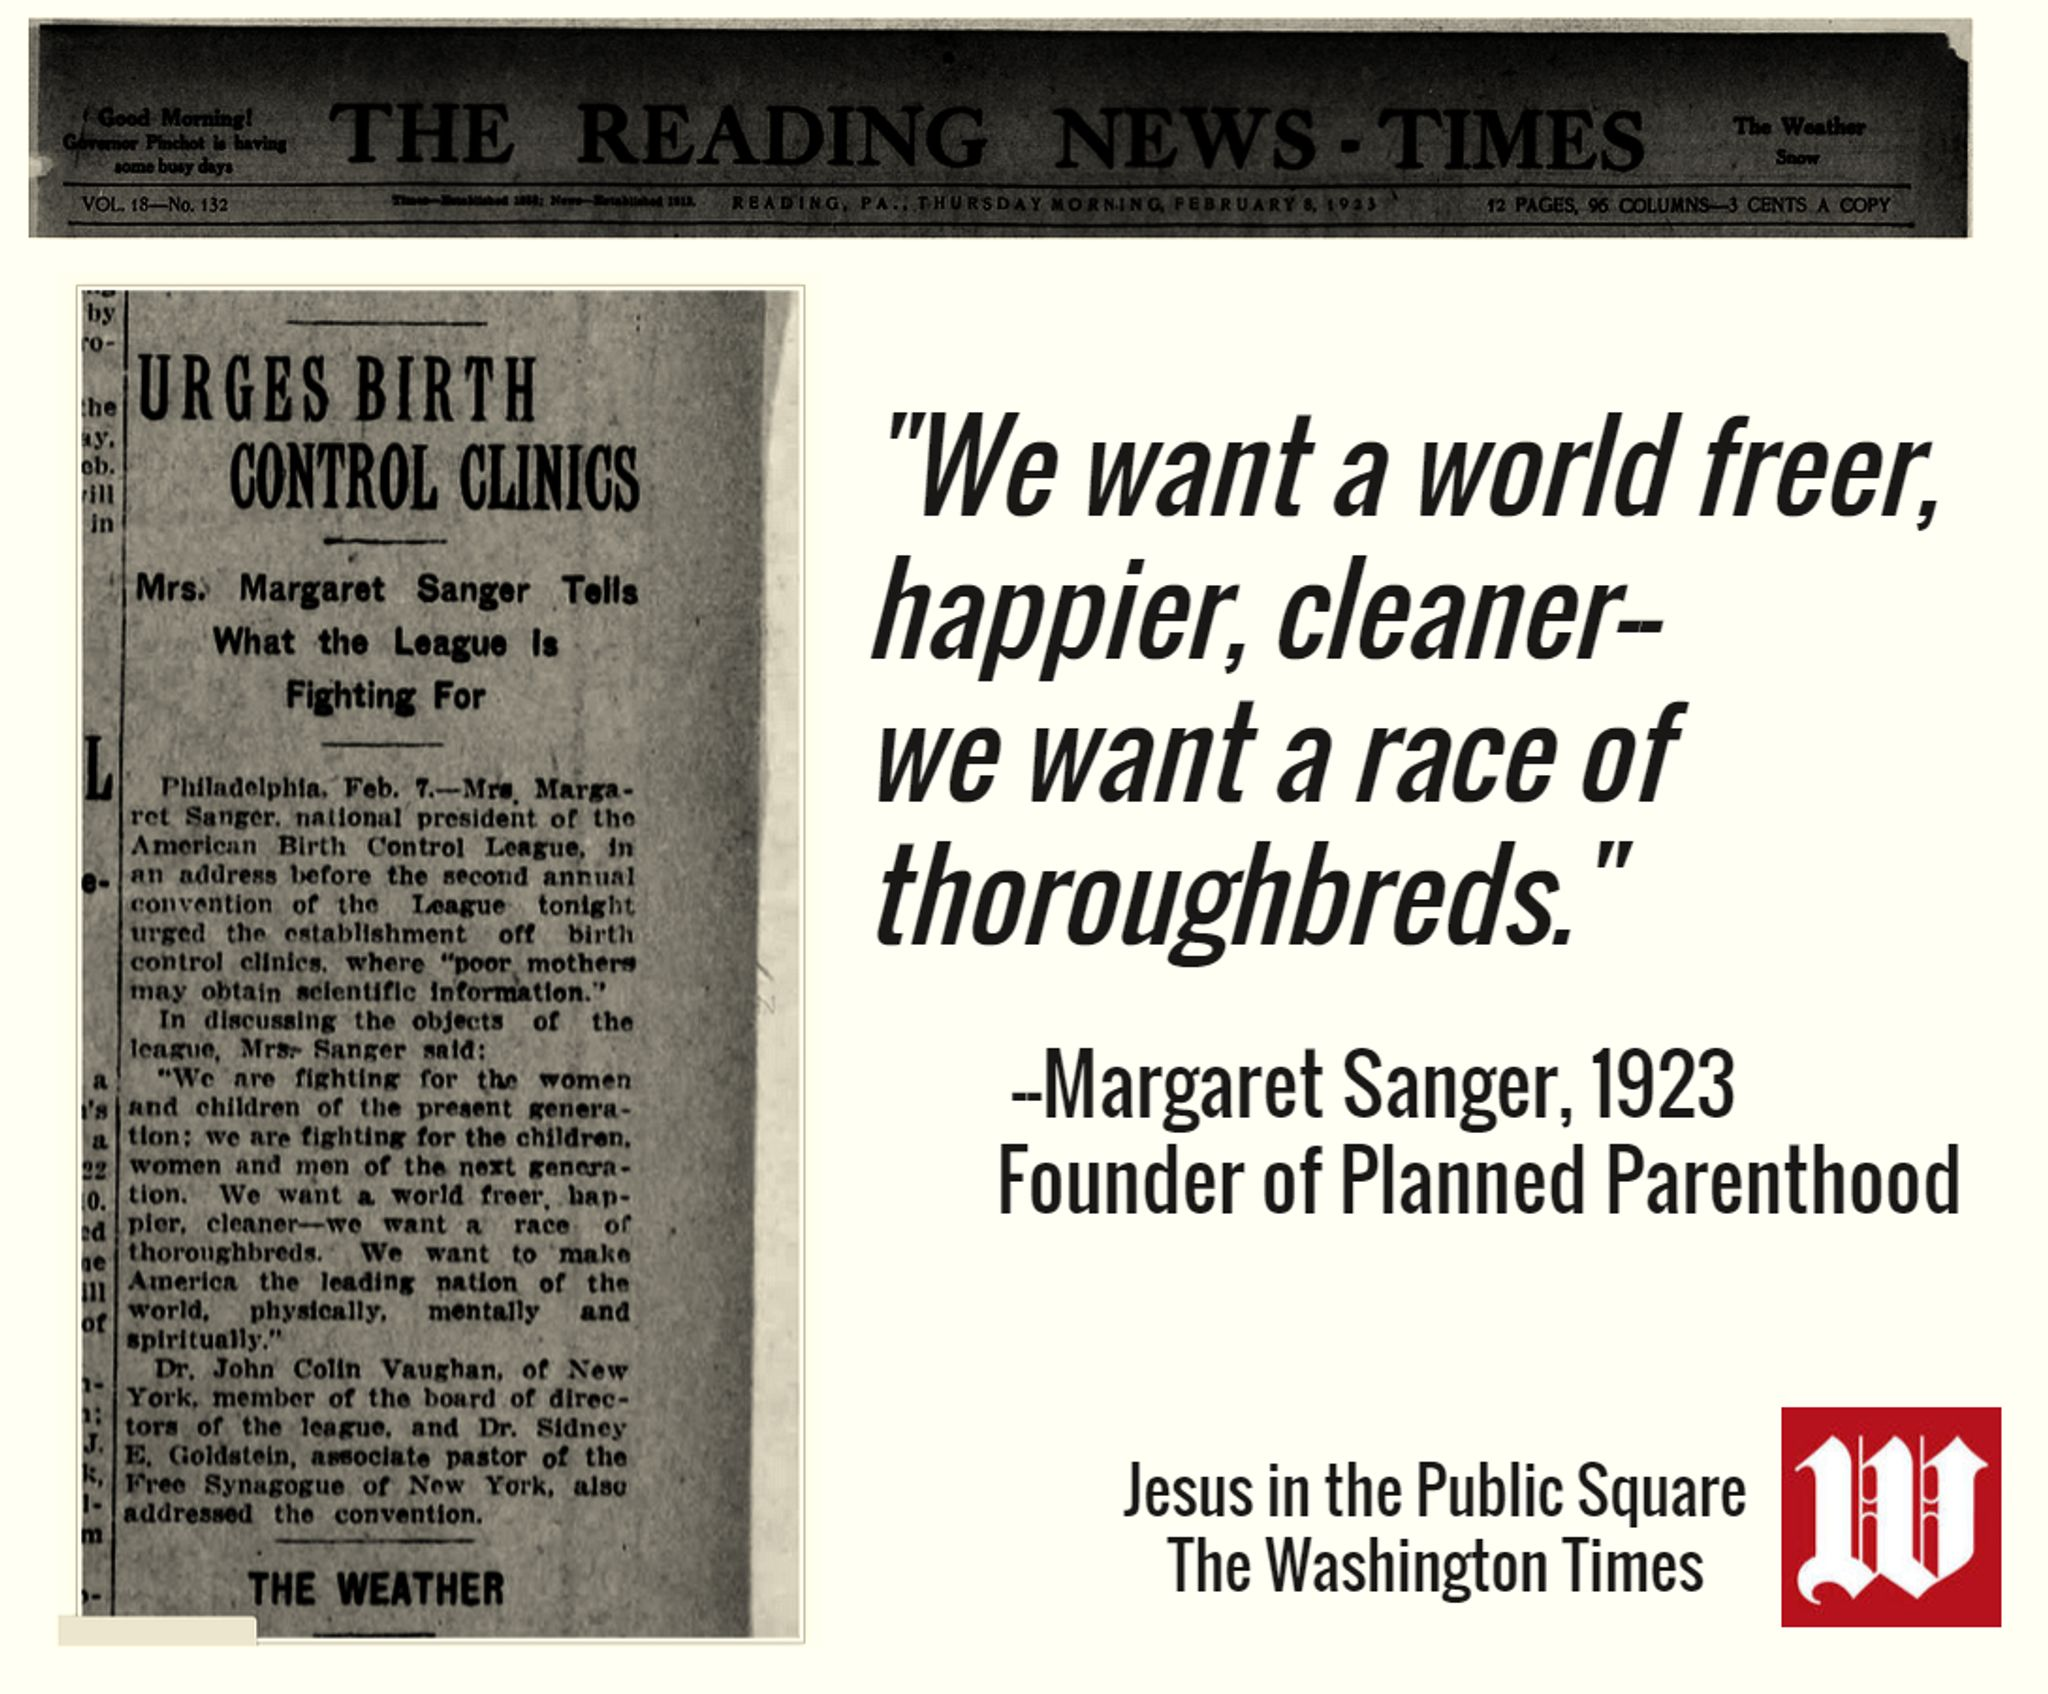 W. SCOTT LAMB: Margaret Sanger wanted a race of thoroughbreds - Washington  Times